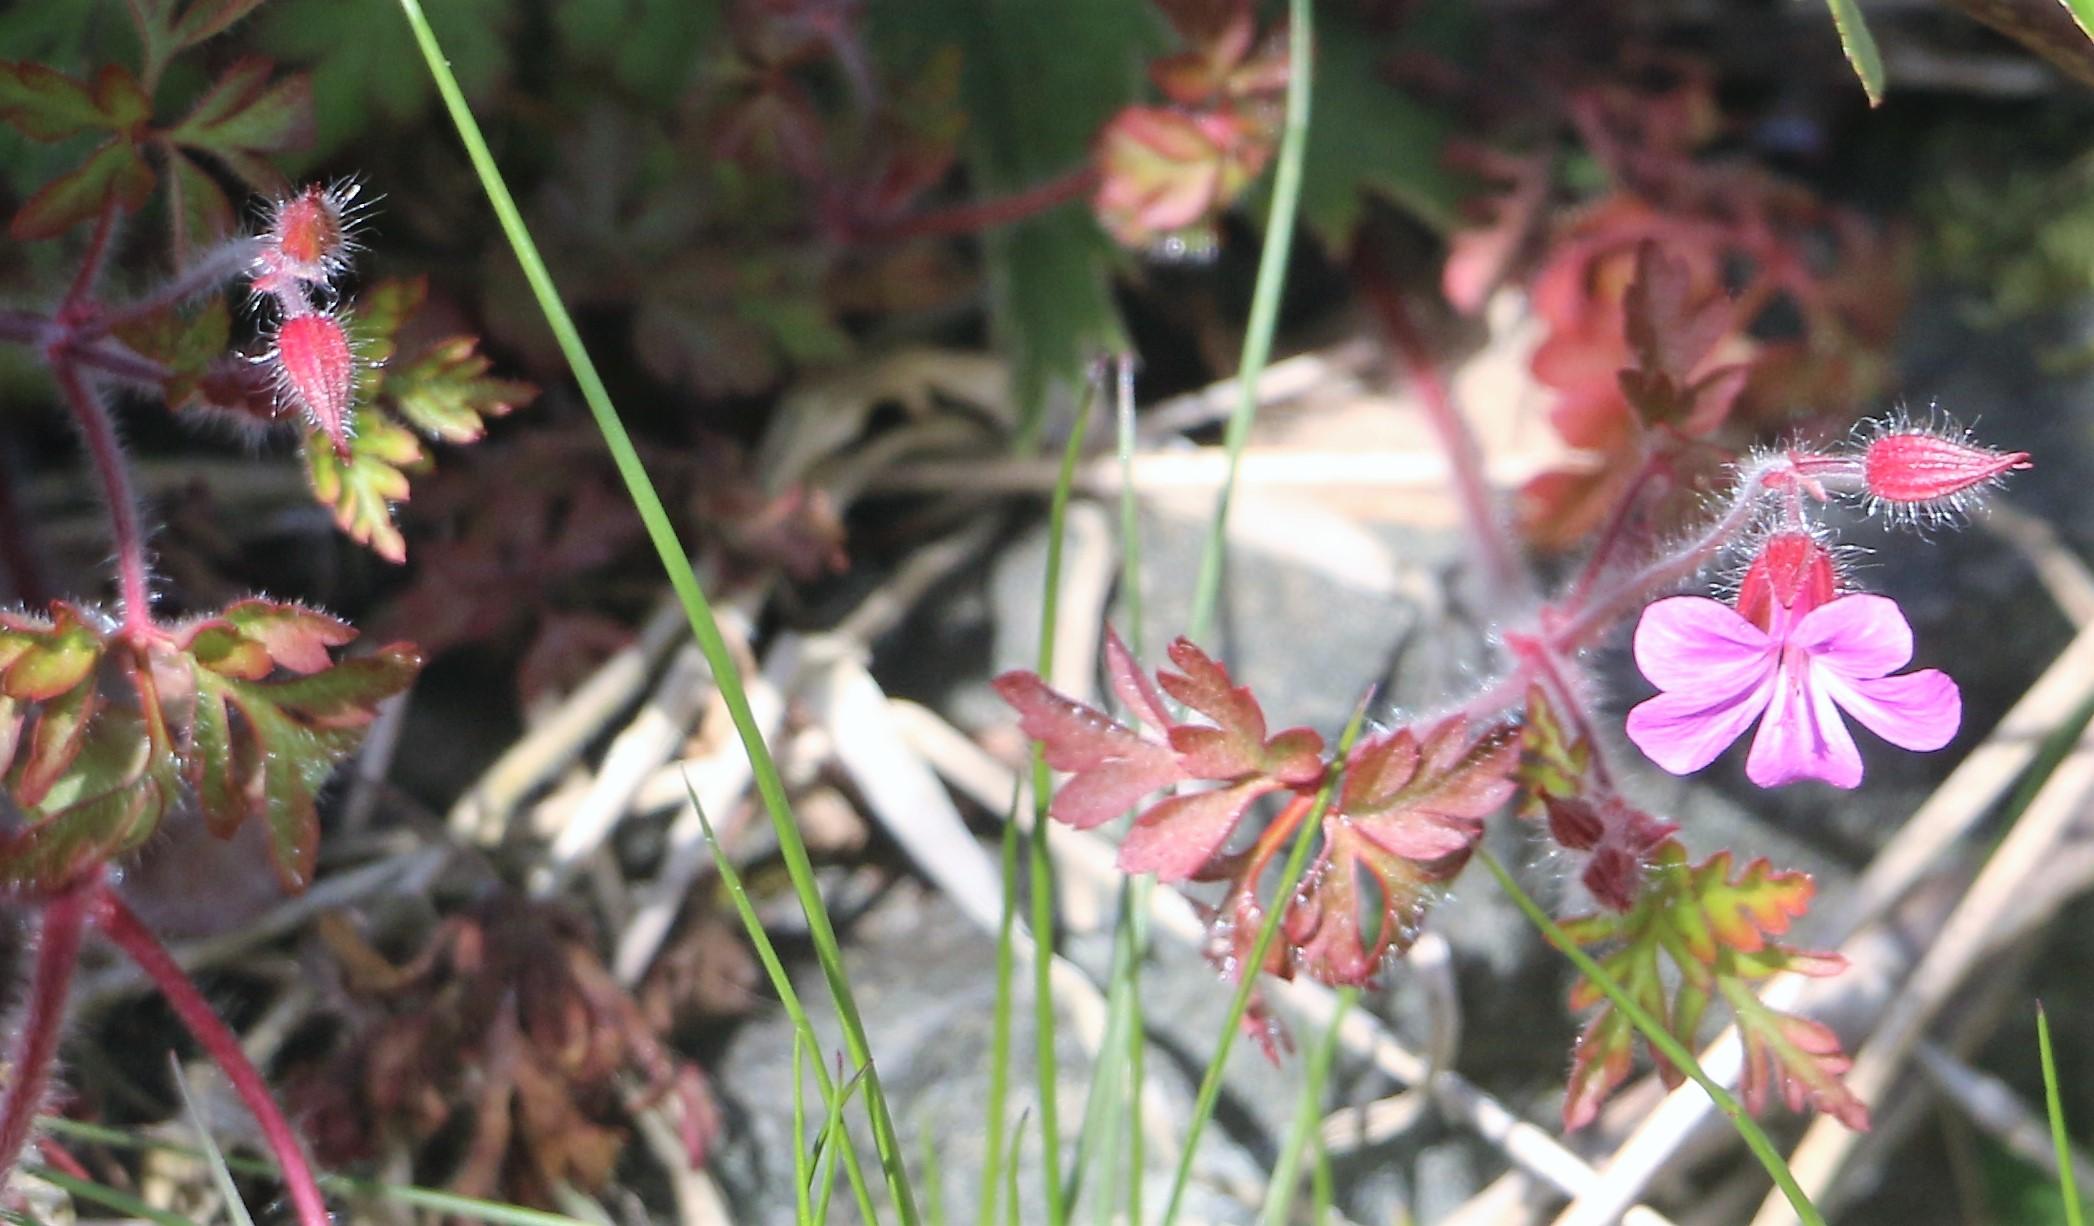 Geranium robertianum. Herb Robert